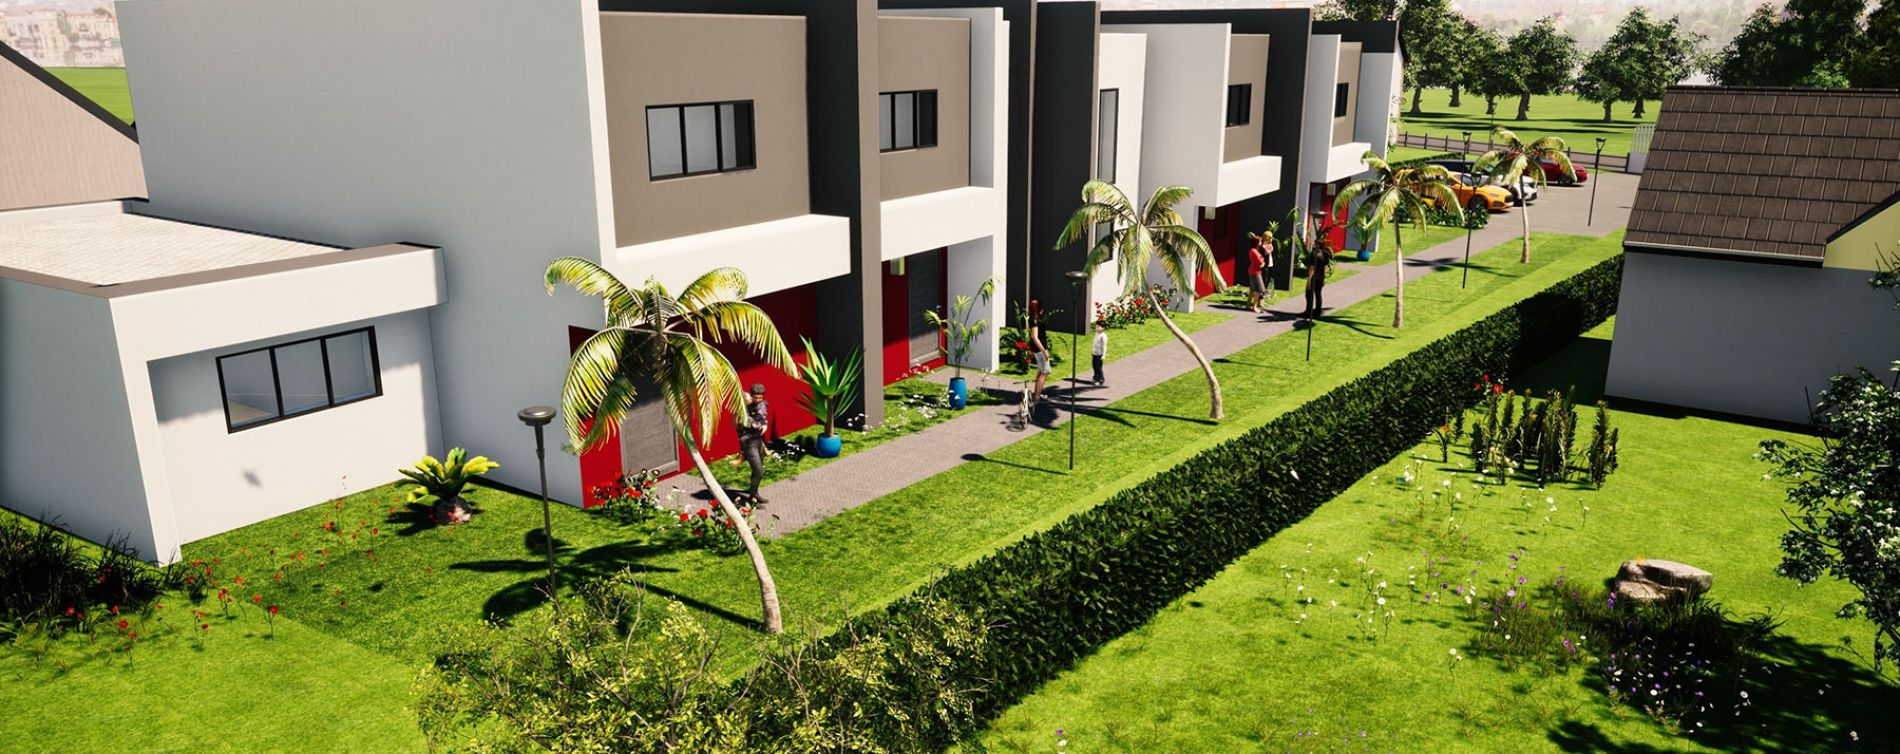 Le Mesnil-Esnard : programme immobilier neuve « Les Villas du Mesnil-Esnard » (2)